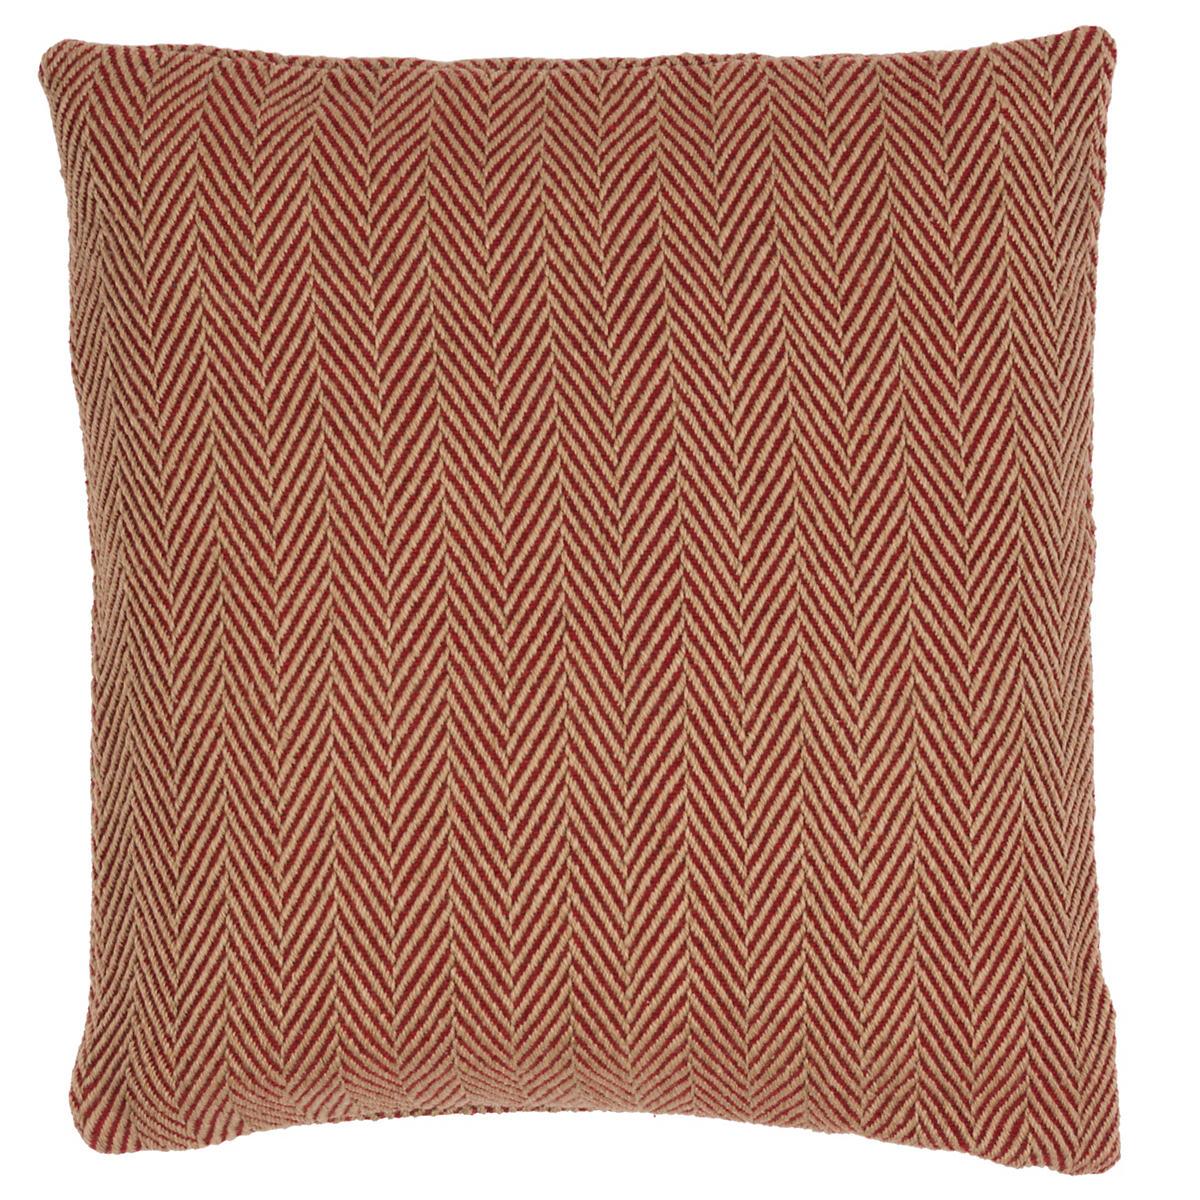 Concord Red Indoor/Outdoor Pillow